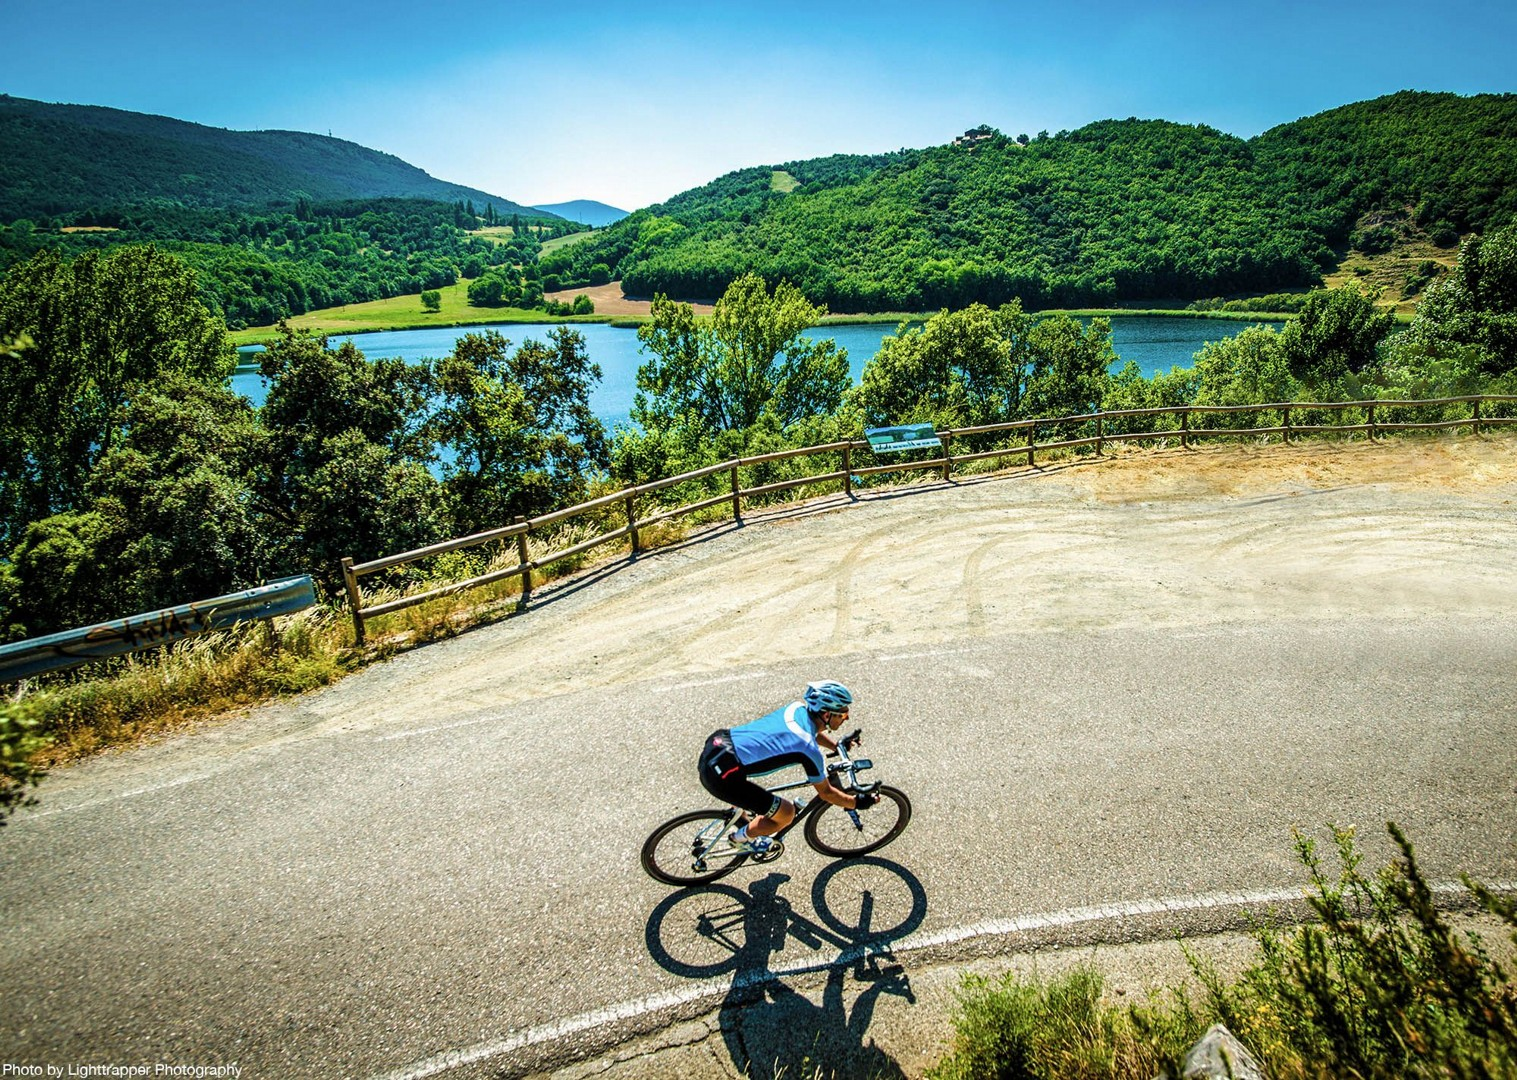 road-cycling-spain-climb-pyrenees-coast-to-coast-holiday.jpg - NEW! Spain - Spanish Pyrenees Coast to Coast - Road Cycling